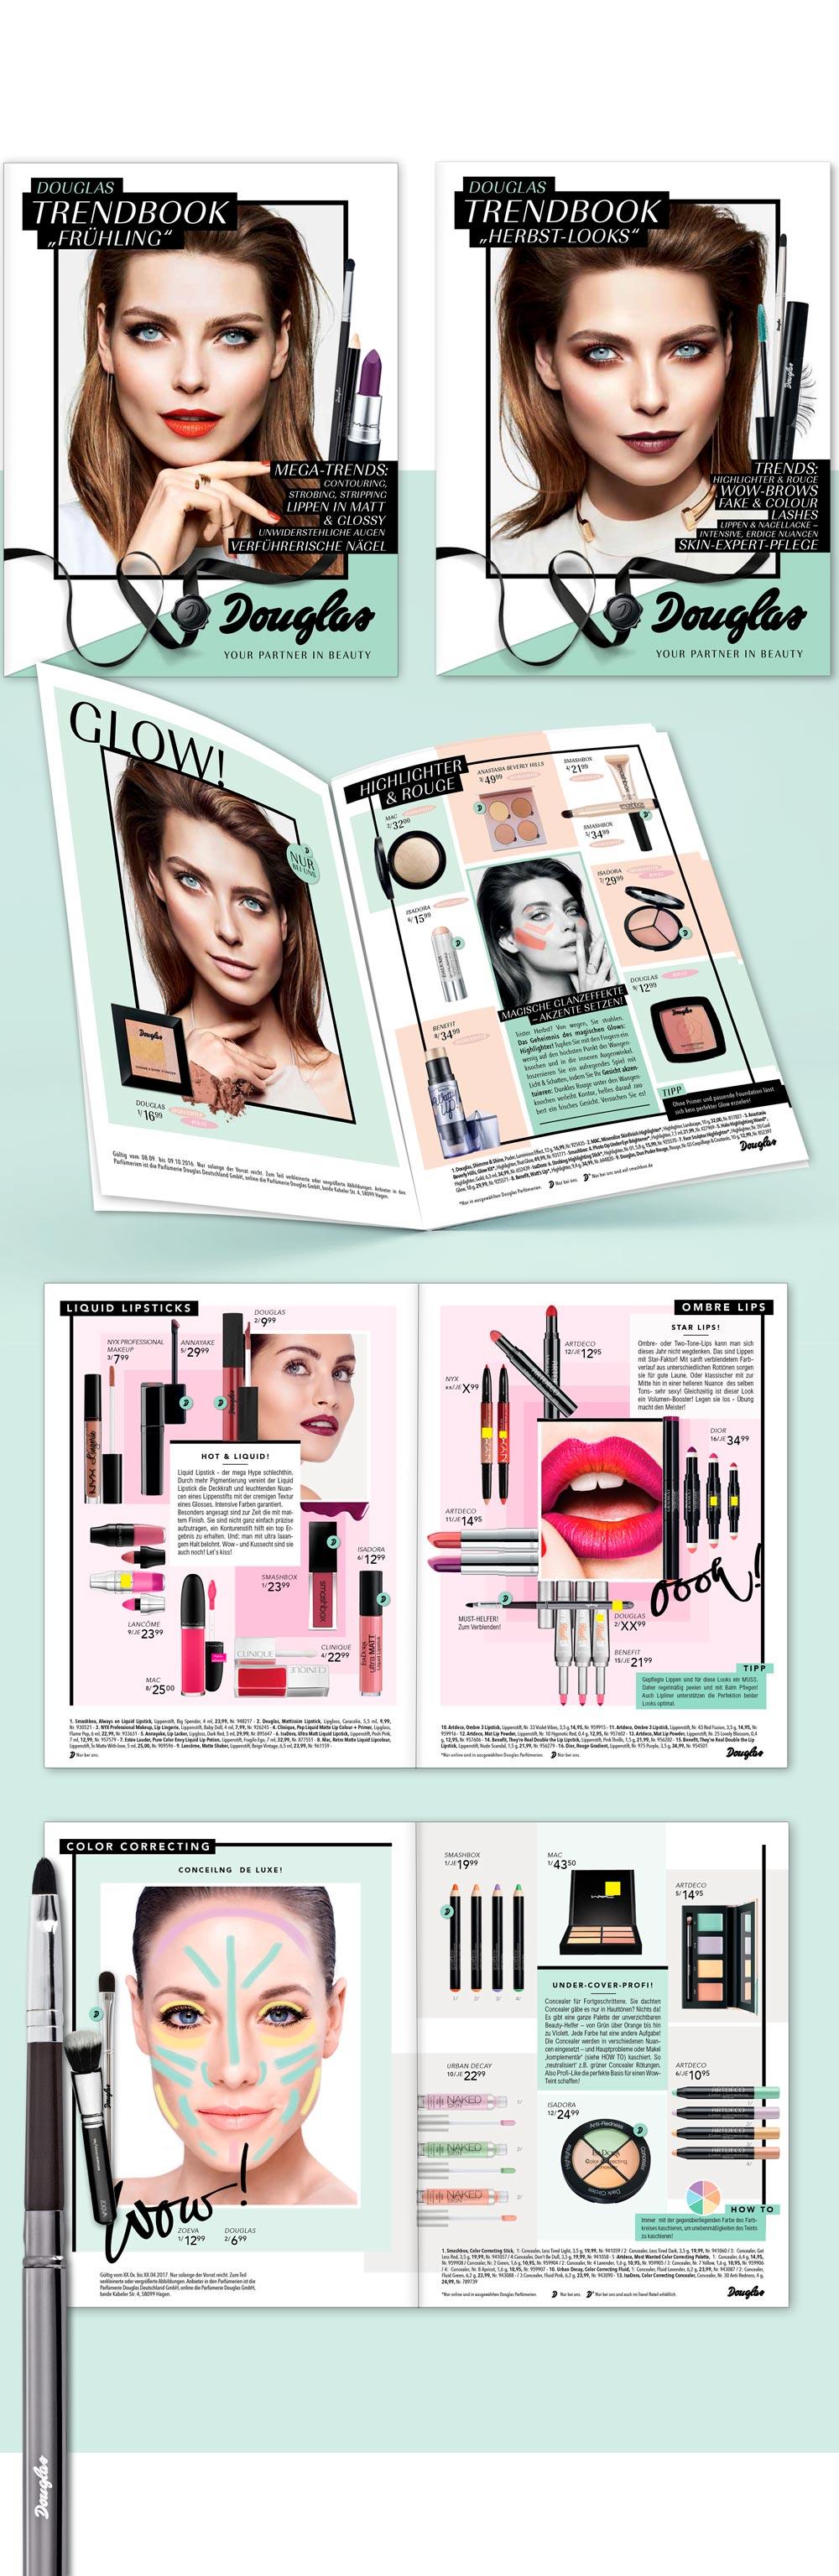 COEN Concept & Design Berlin - Douglas Make Up